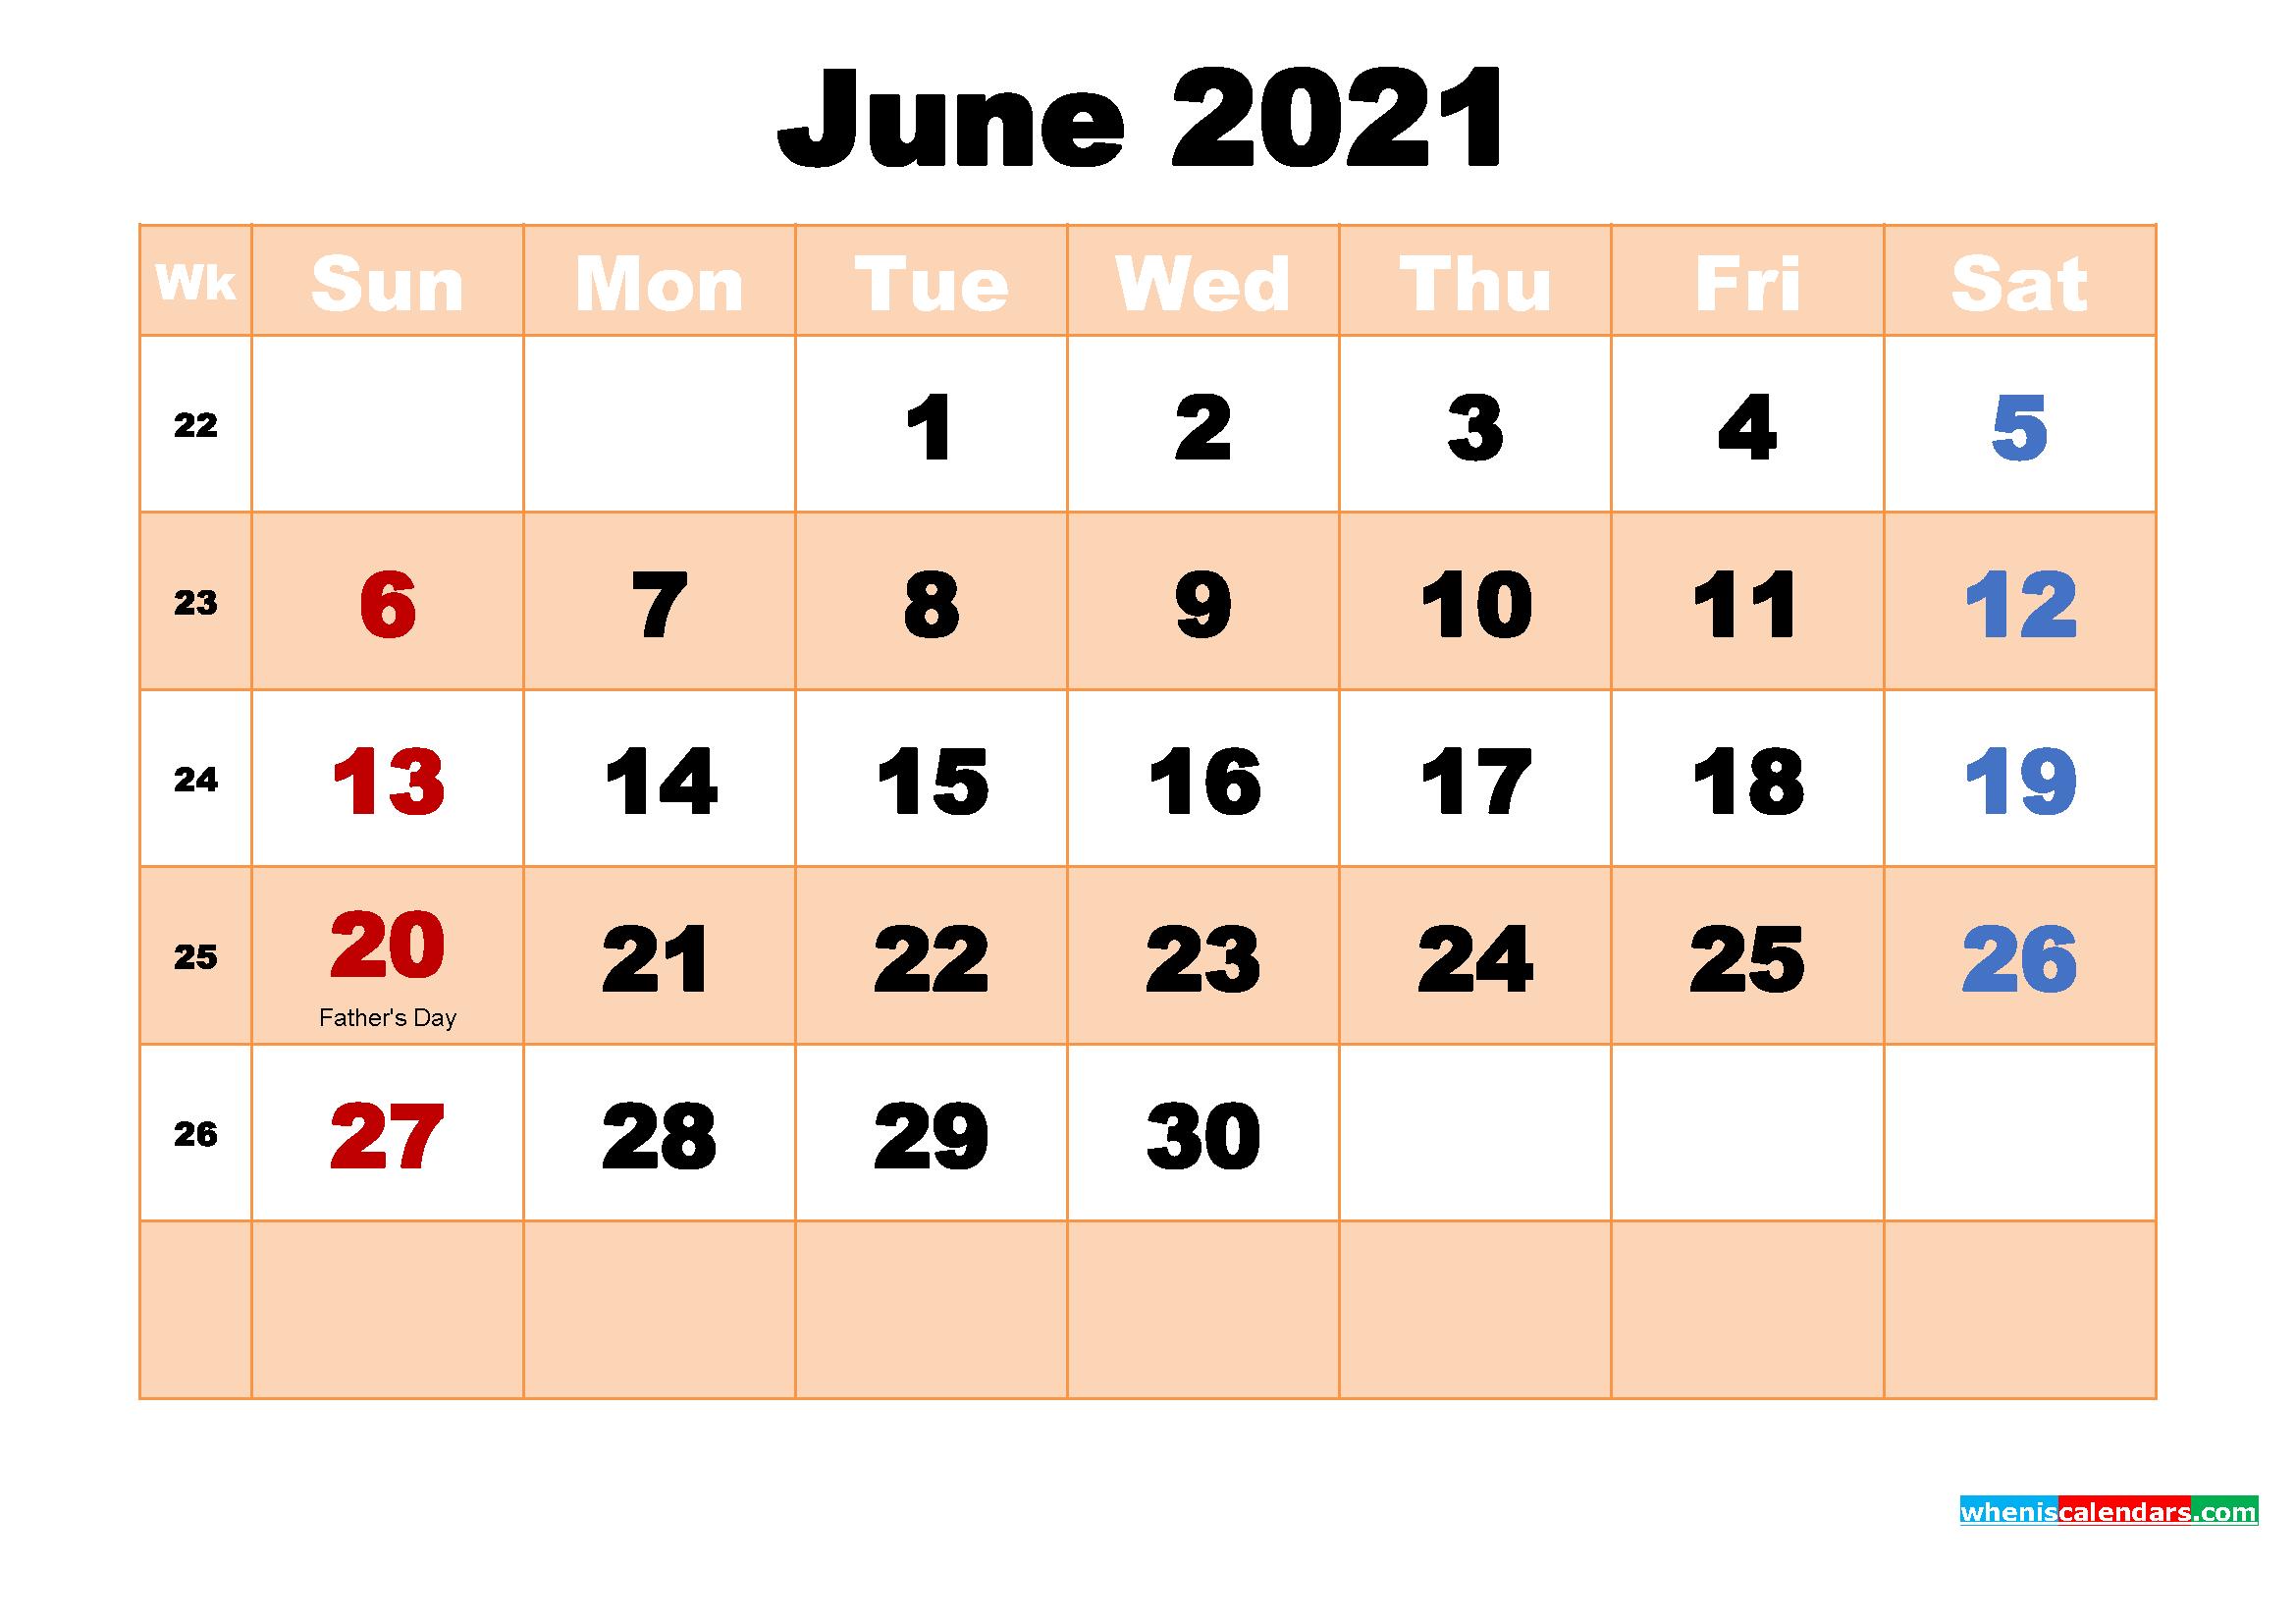 June 2021 Calendar with Holidays Wallpaper